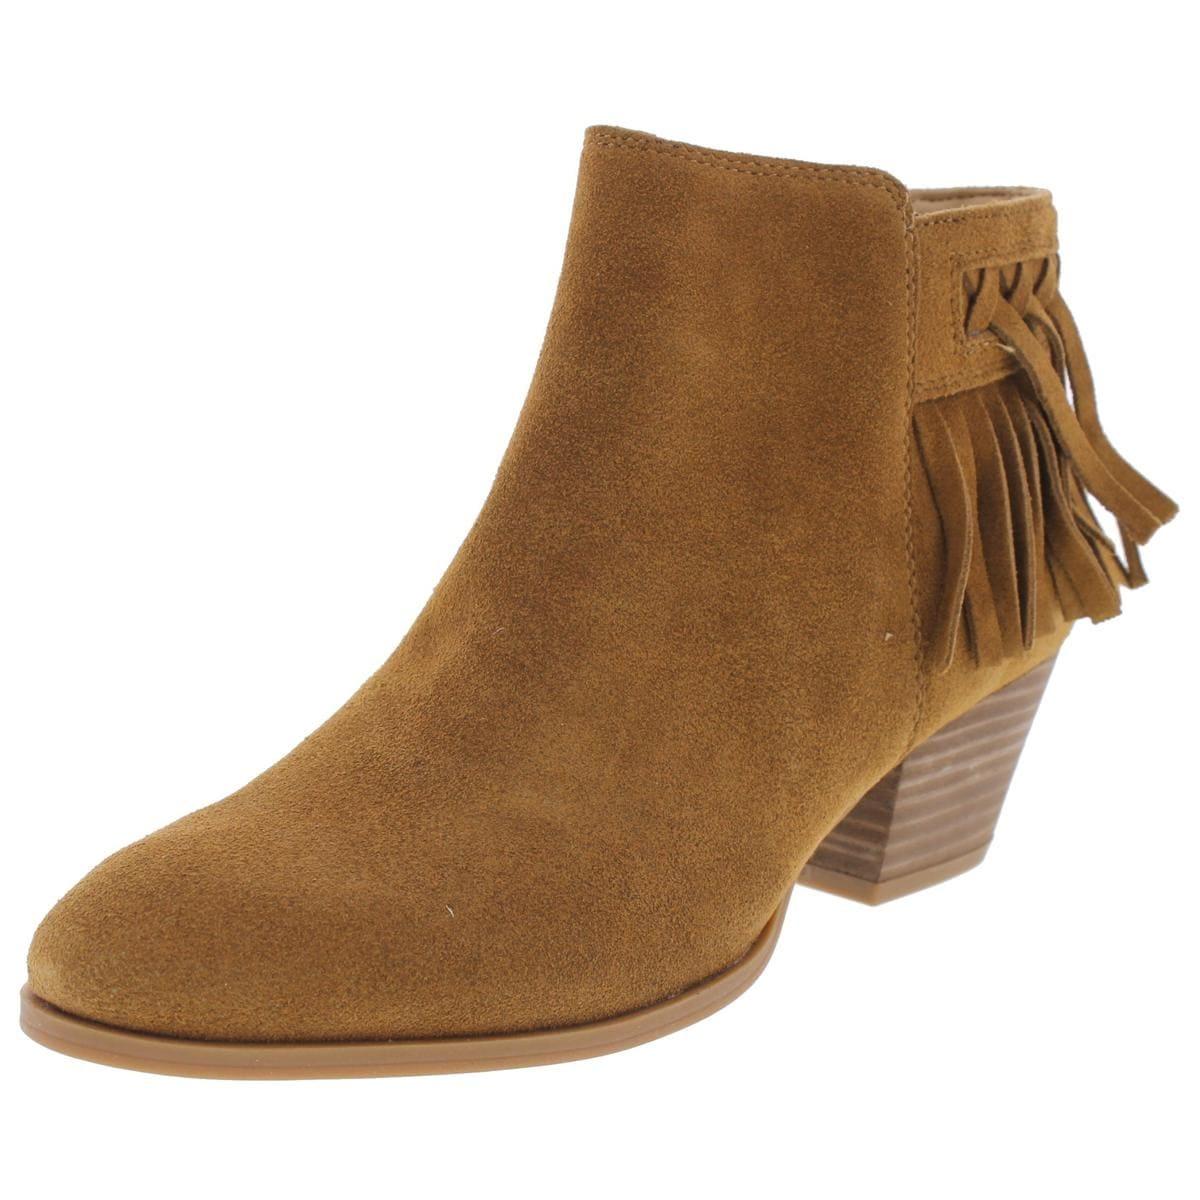 Buy Brown Franco Sarto Womens Boots Online At Our Clarette Sandals Cristina Beige Best Shoes Deals